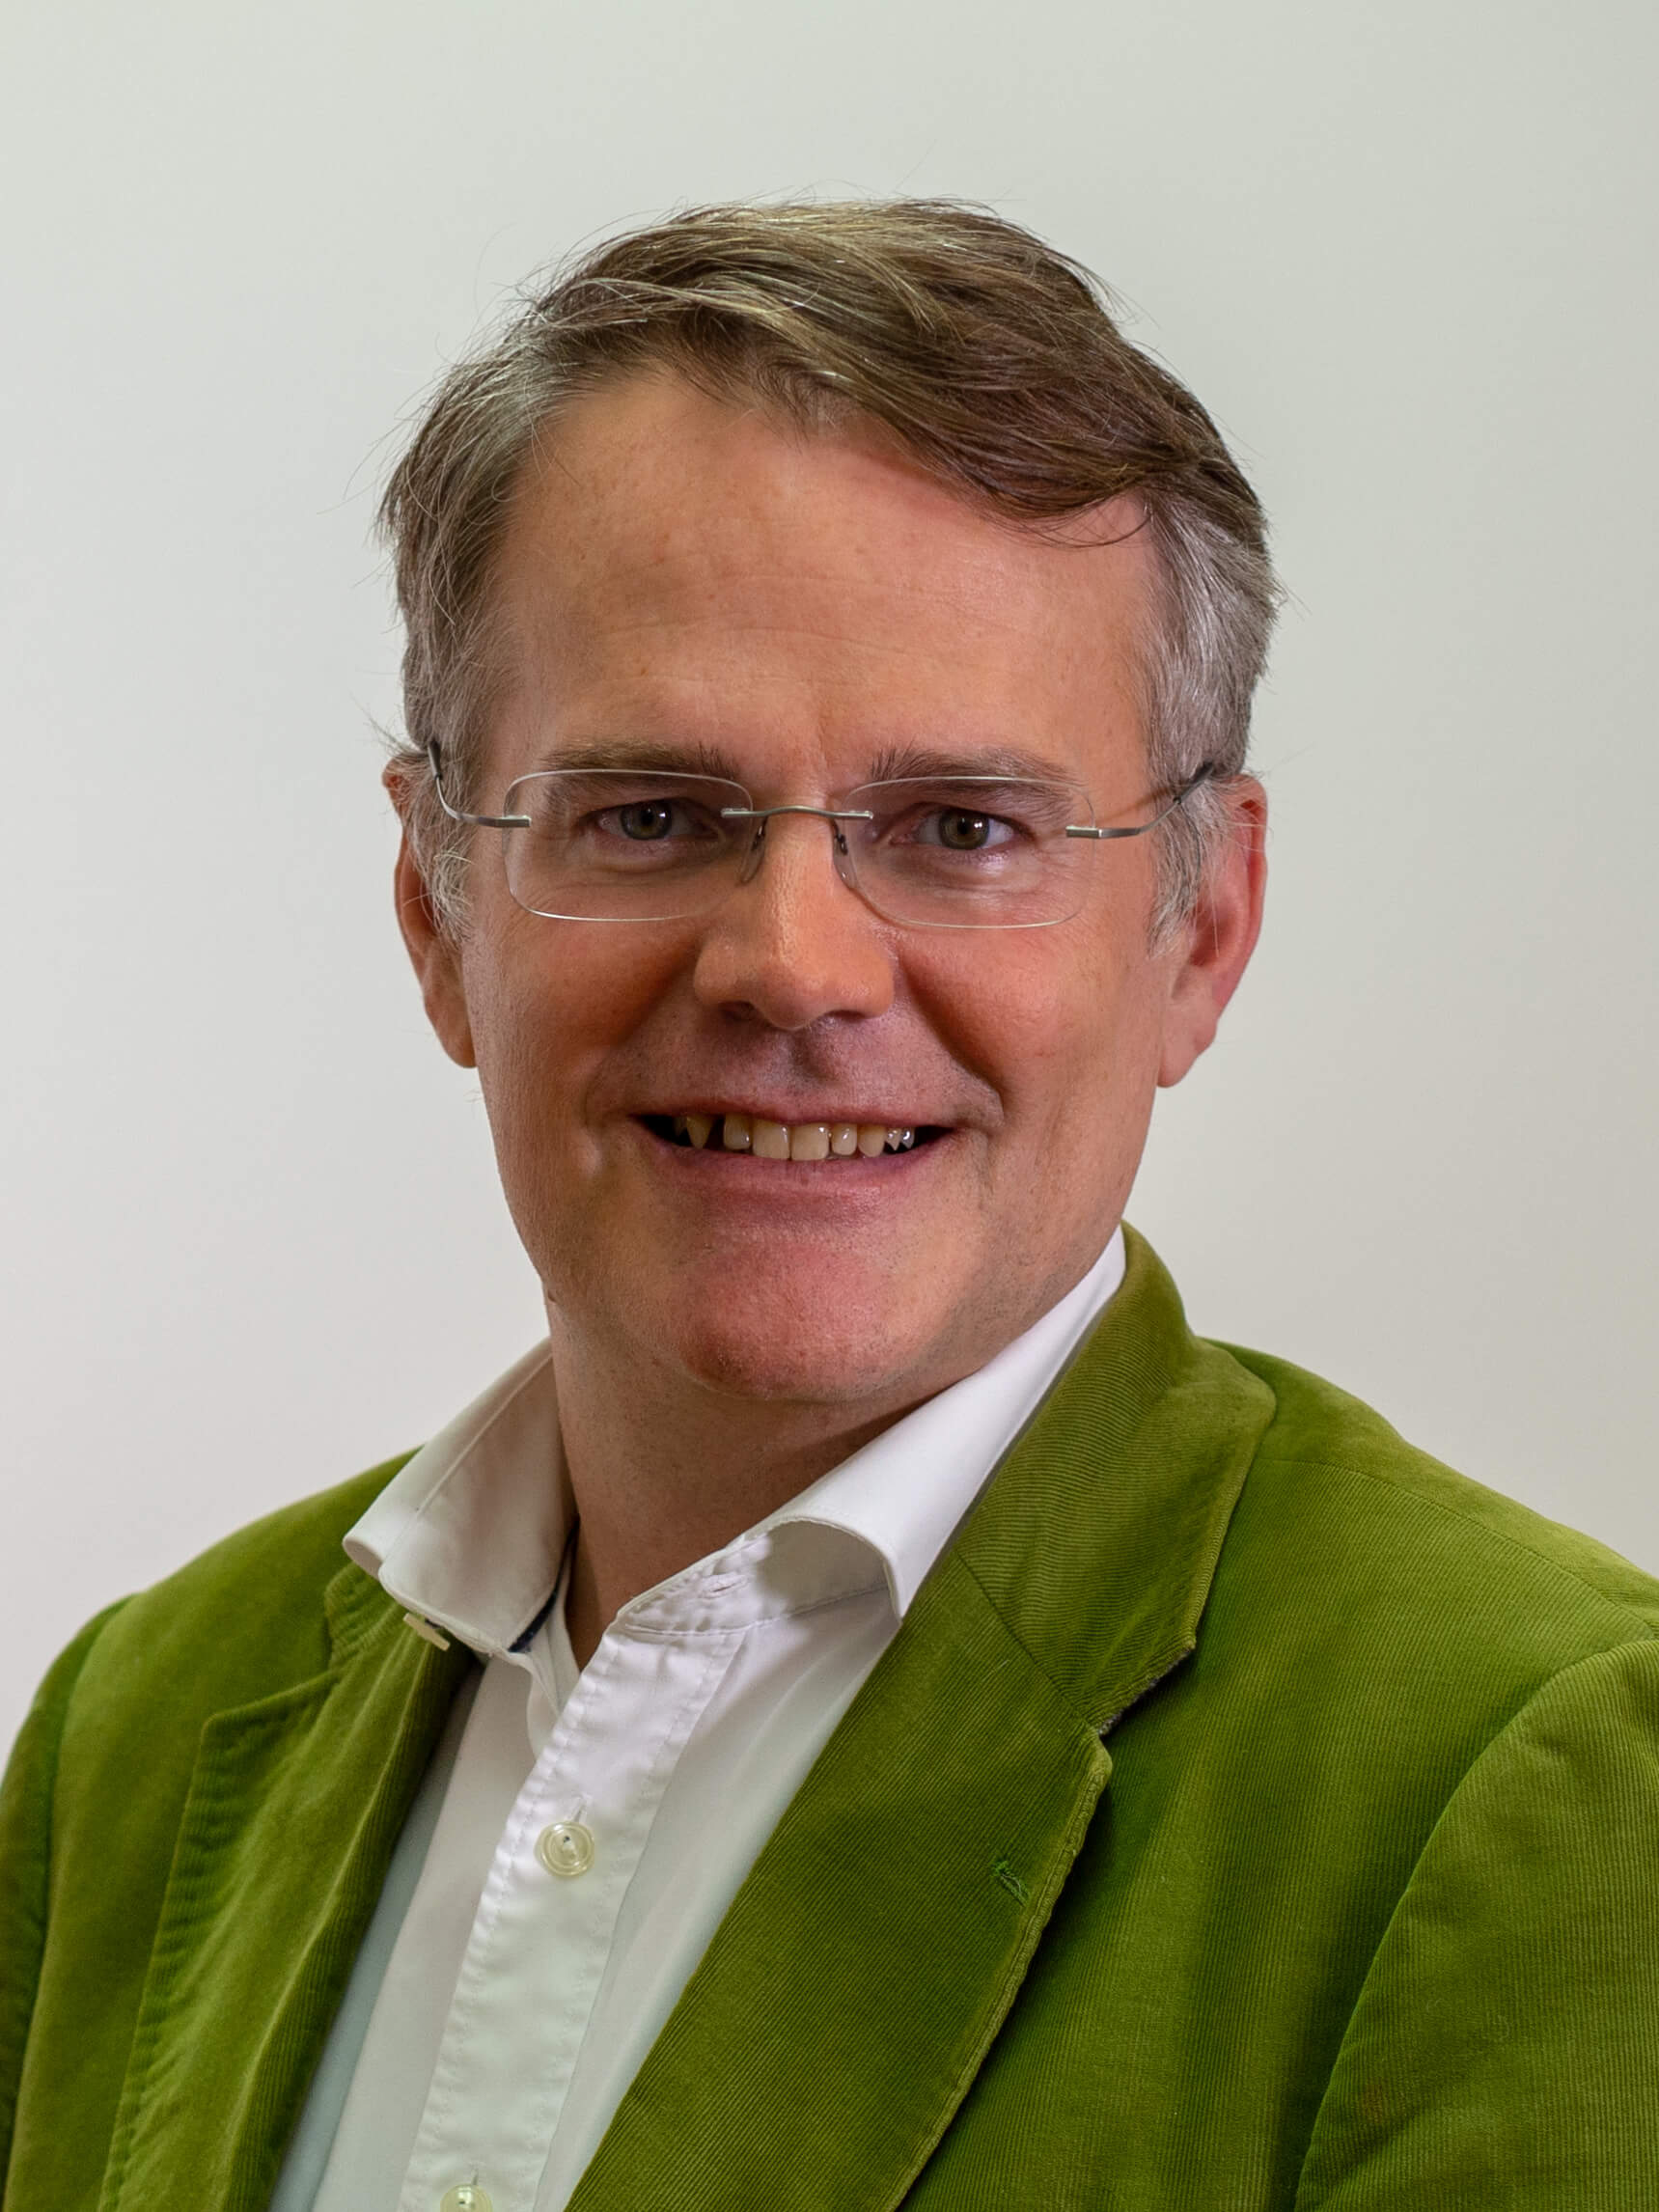 Dr. Rainer Watzak